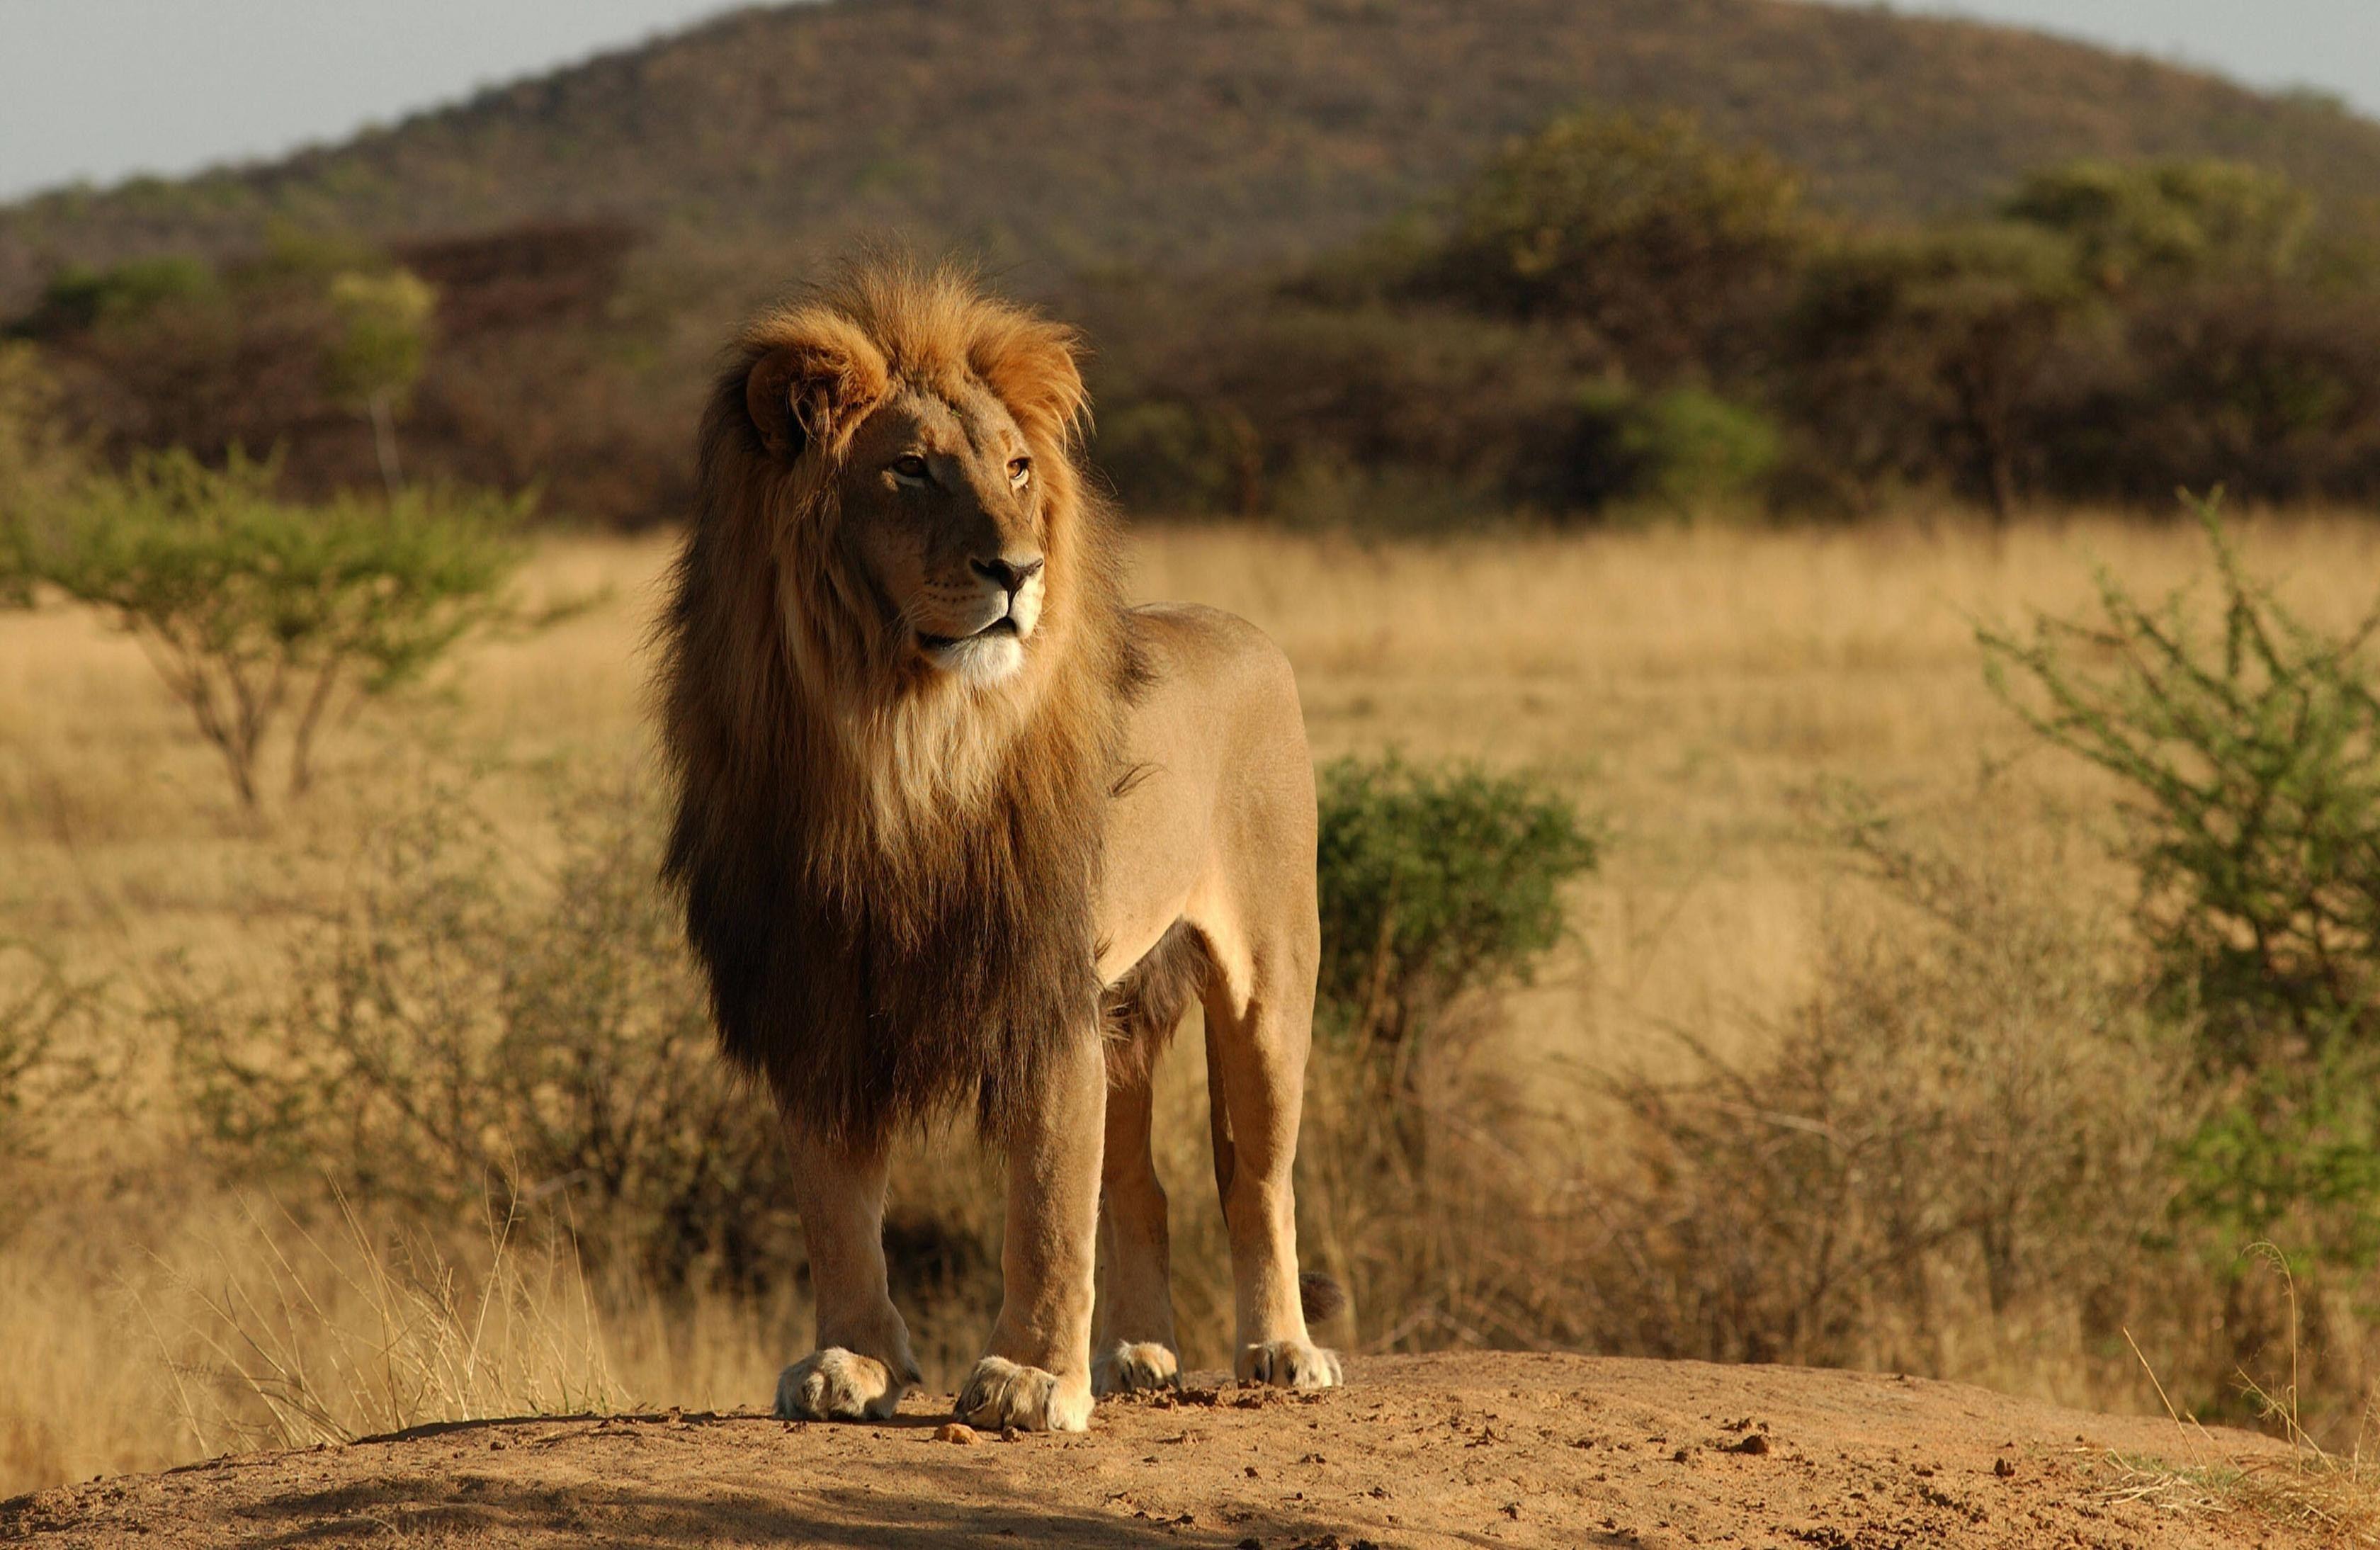 Lion Background Hd Lion Category Wallpaperscreator Pinterest